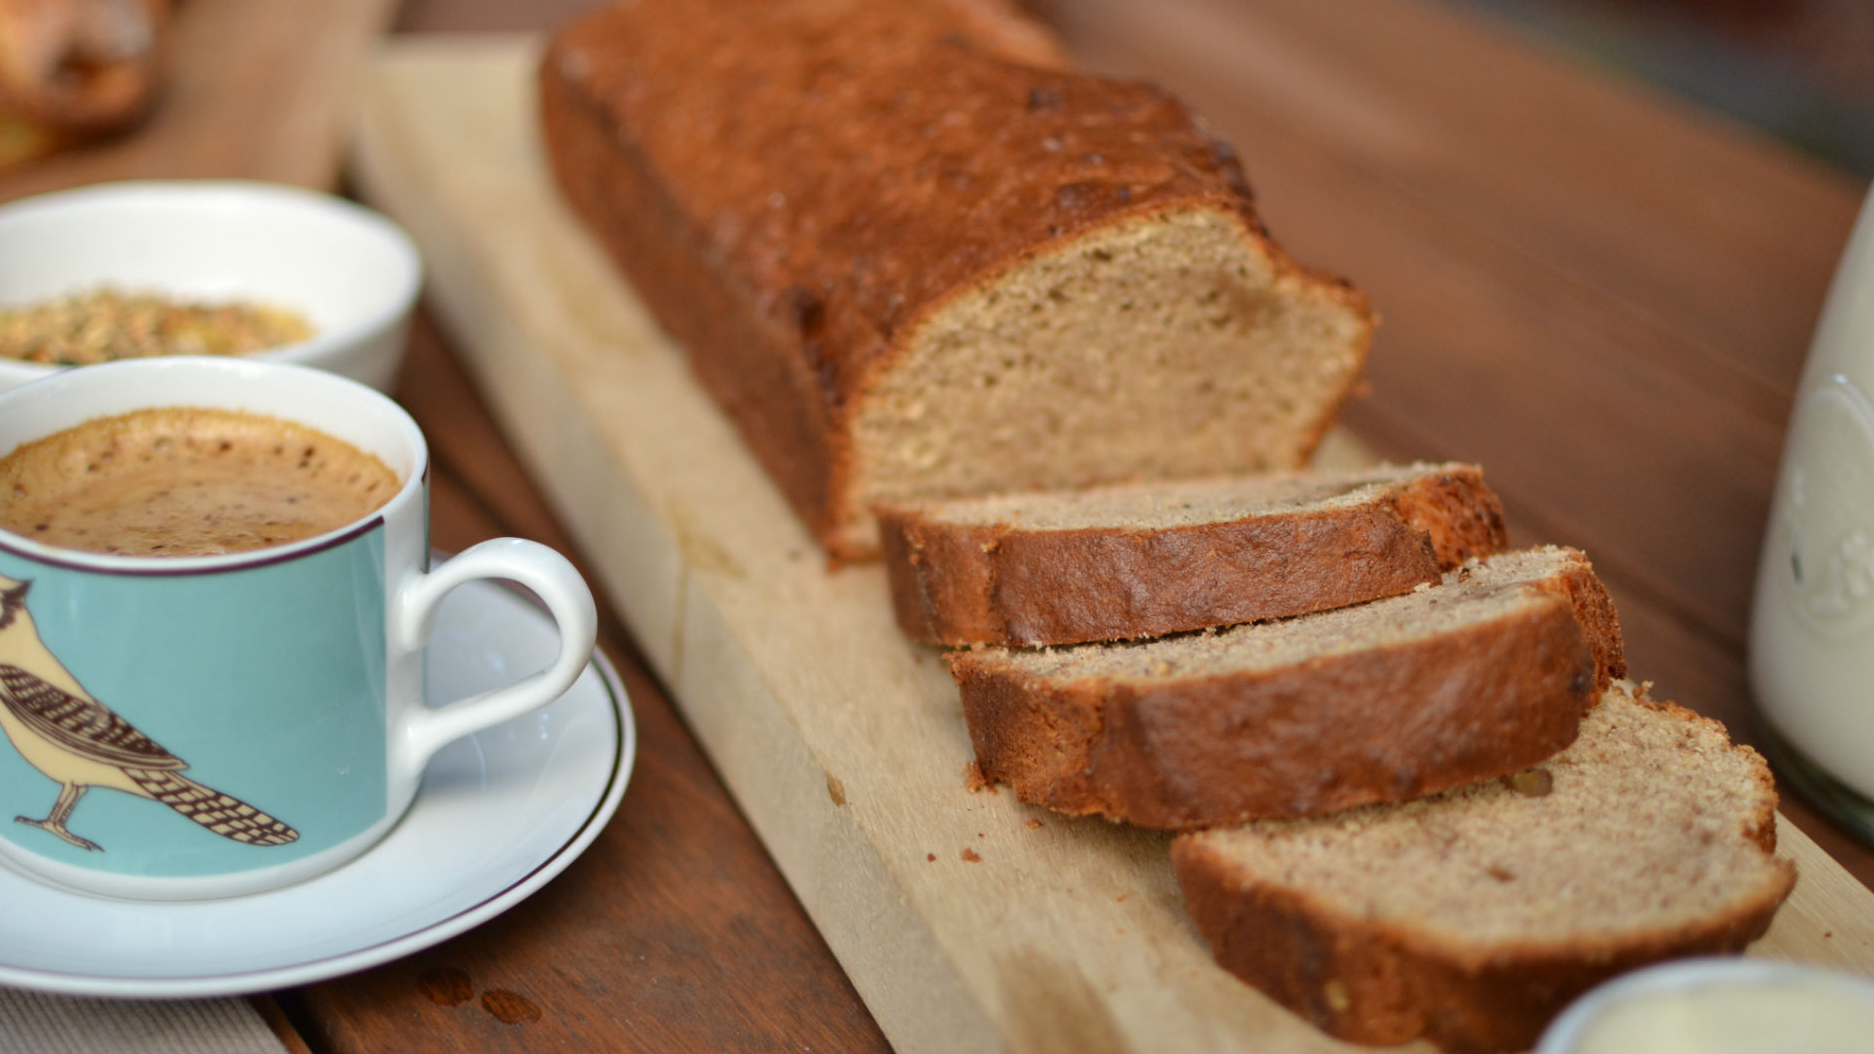 Cafe_+_bread-1515703185.jpg